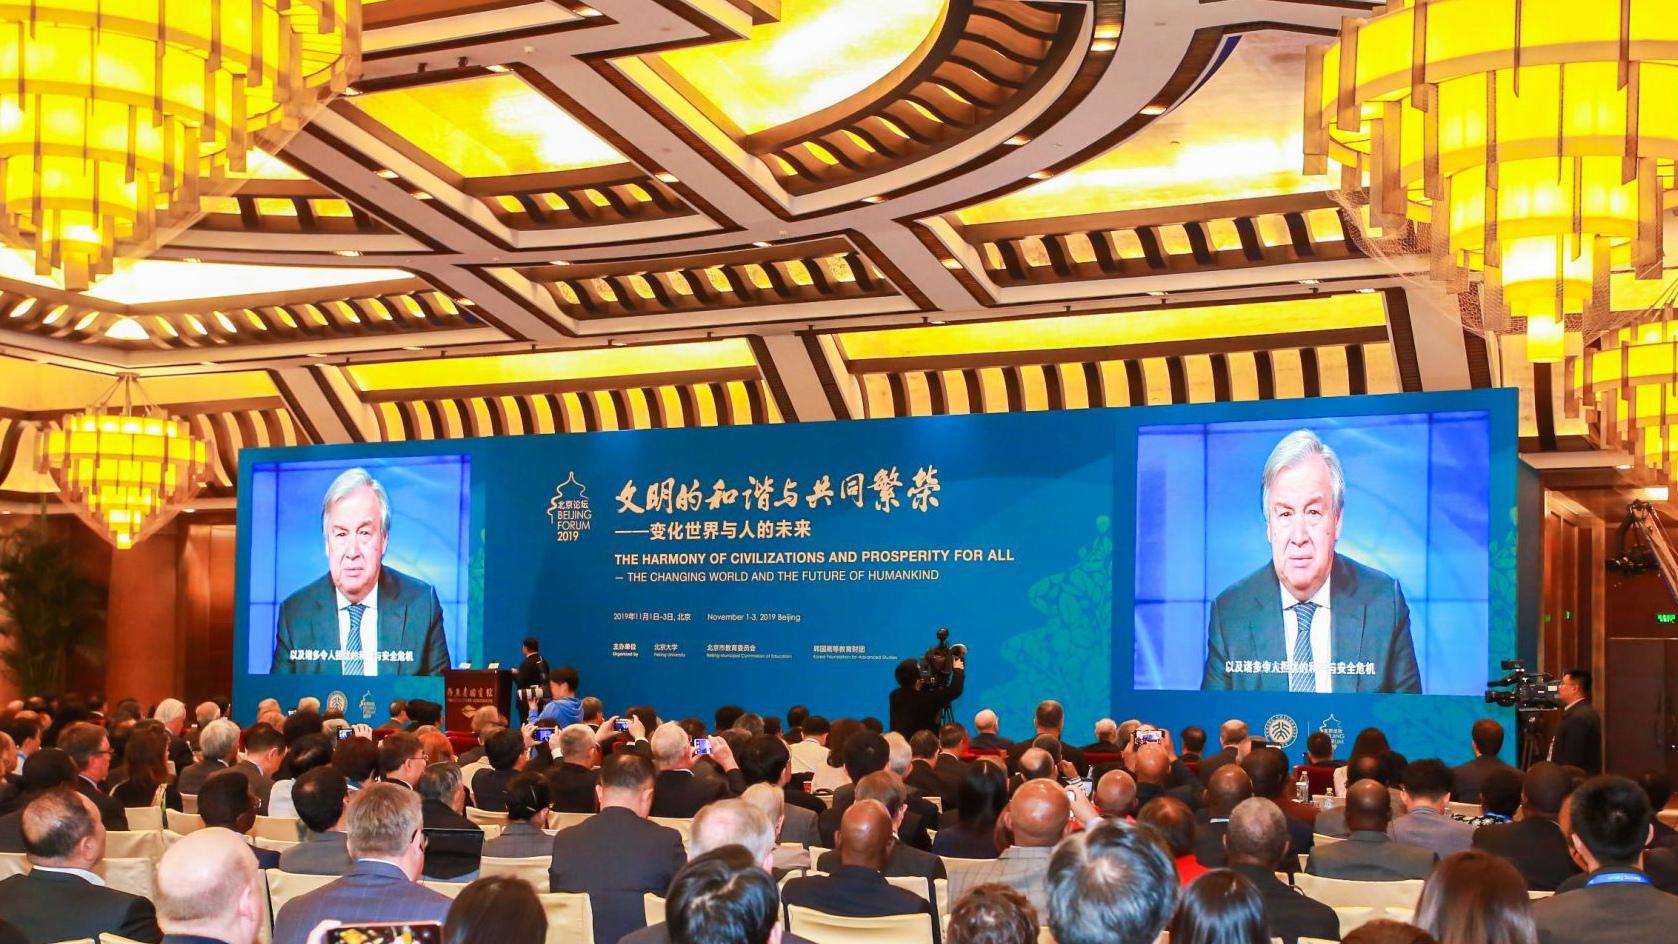 Beijing Forum 2019 kicks off at Beijing's Diaoyutai State Guest House